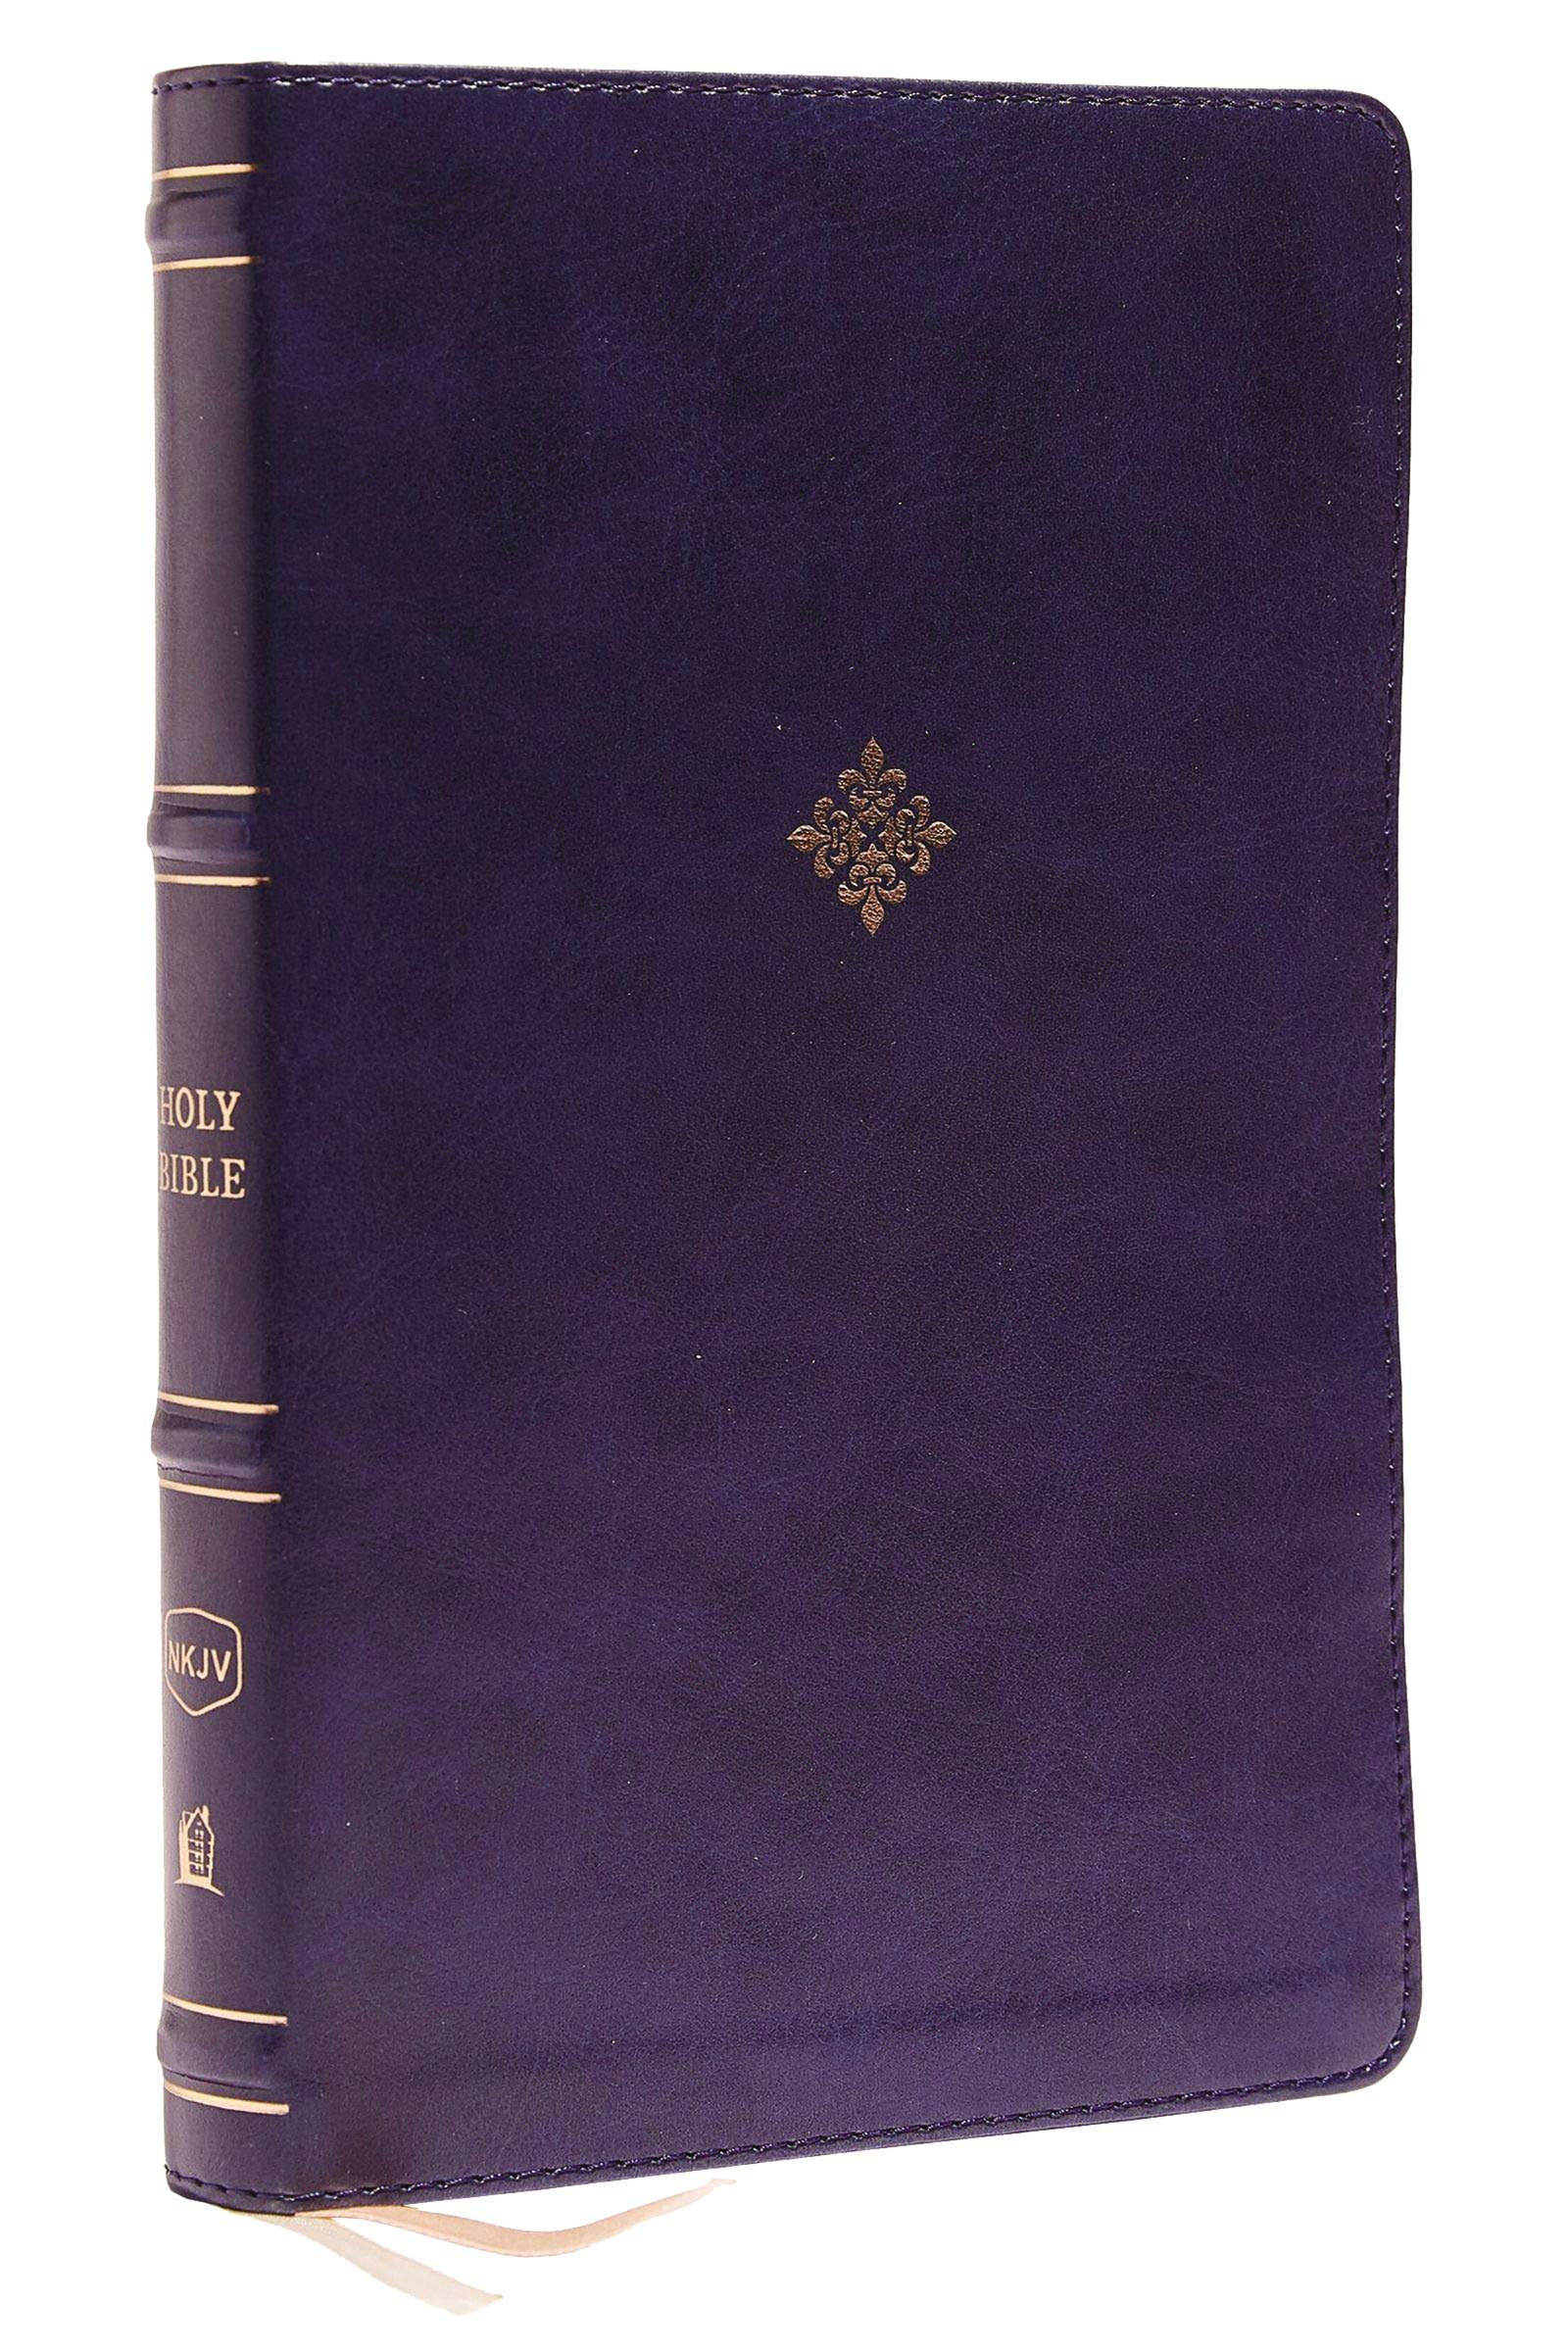 NKJV Thinline Bible (Comfort Print)-Navy Blue LeatherSoft Indexed